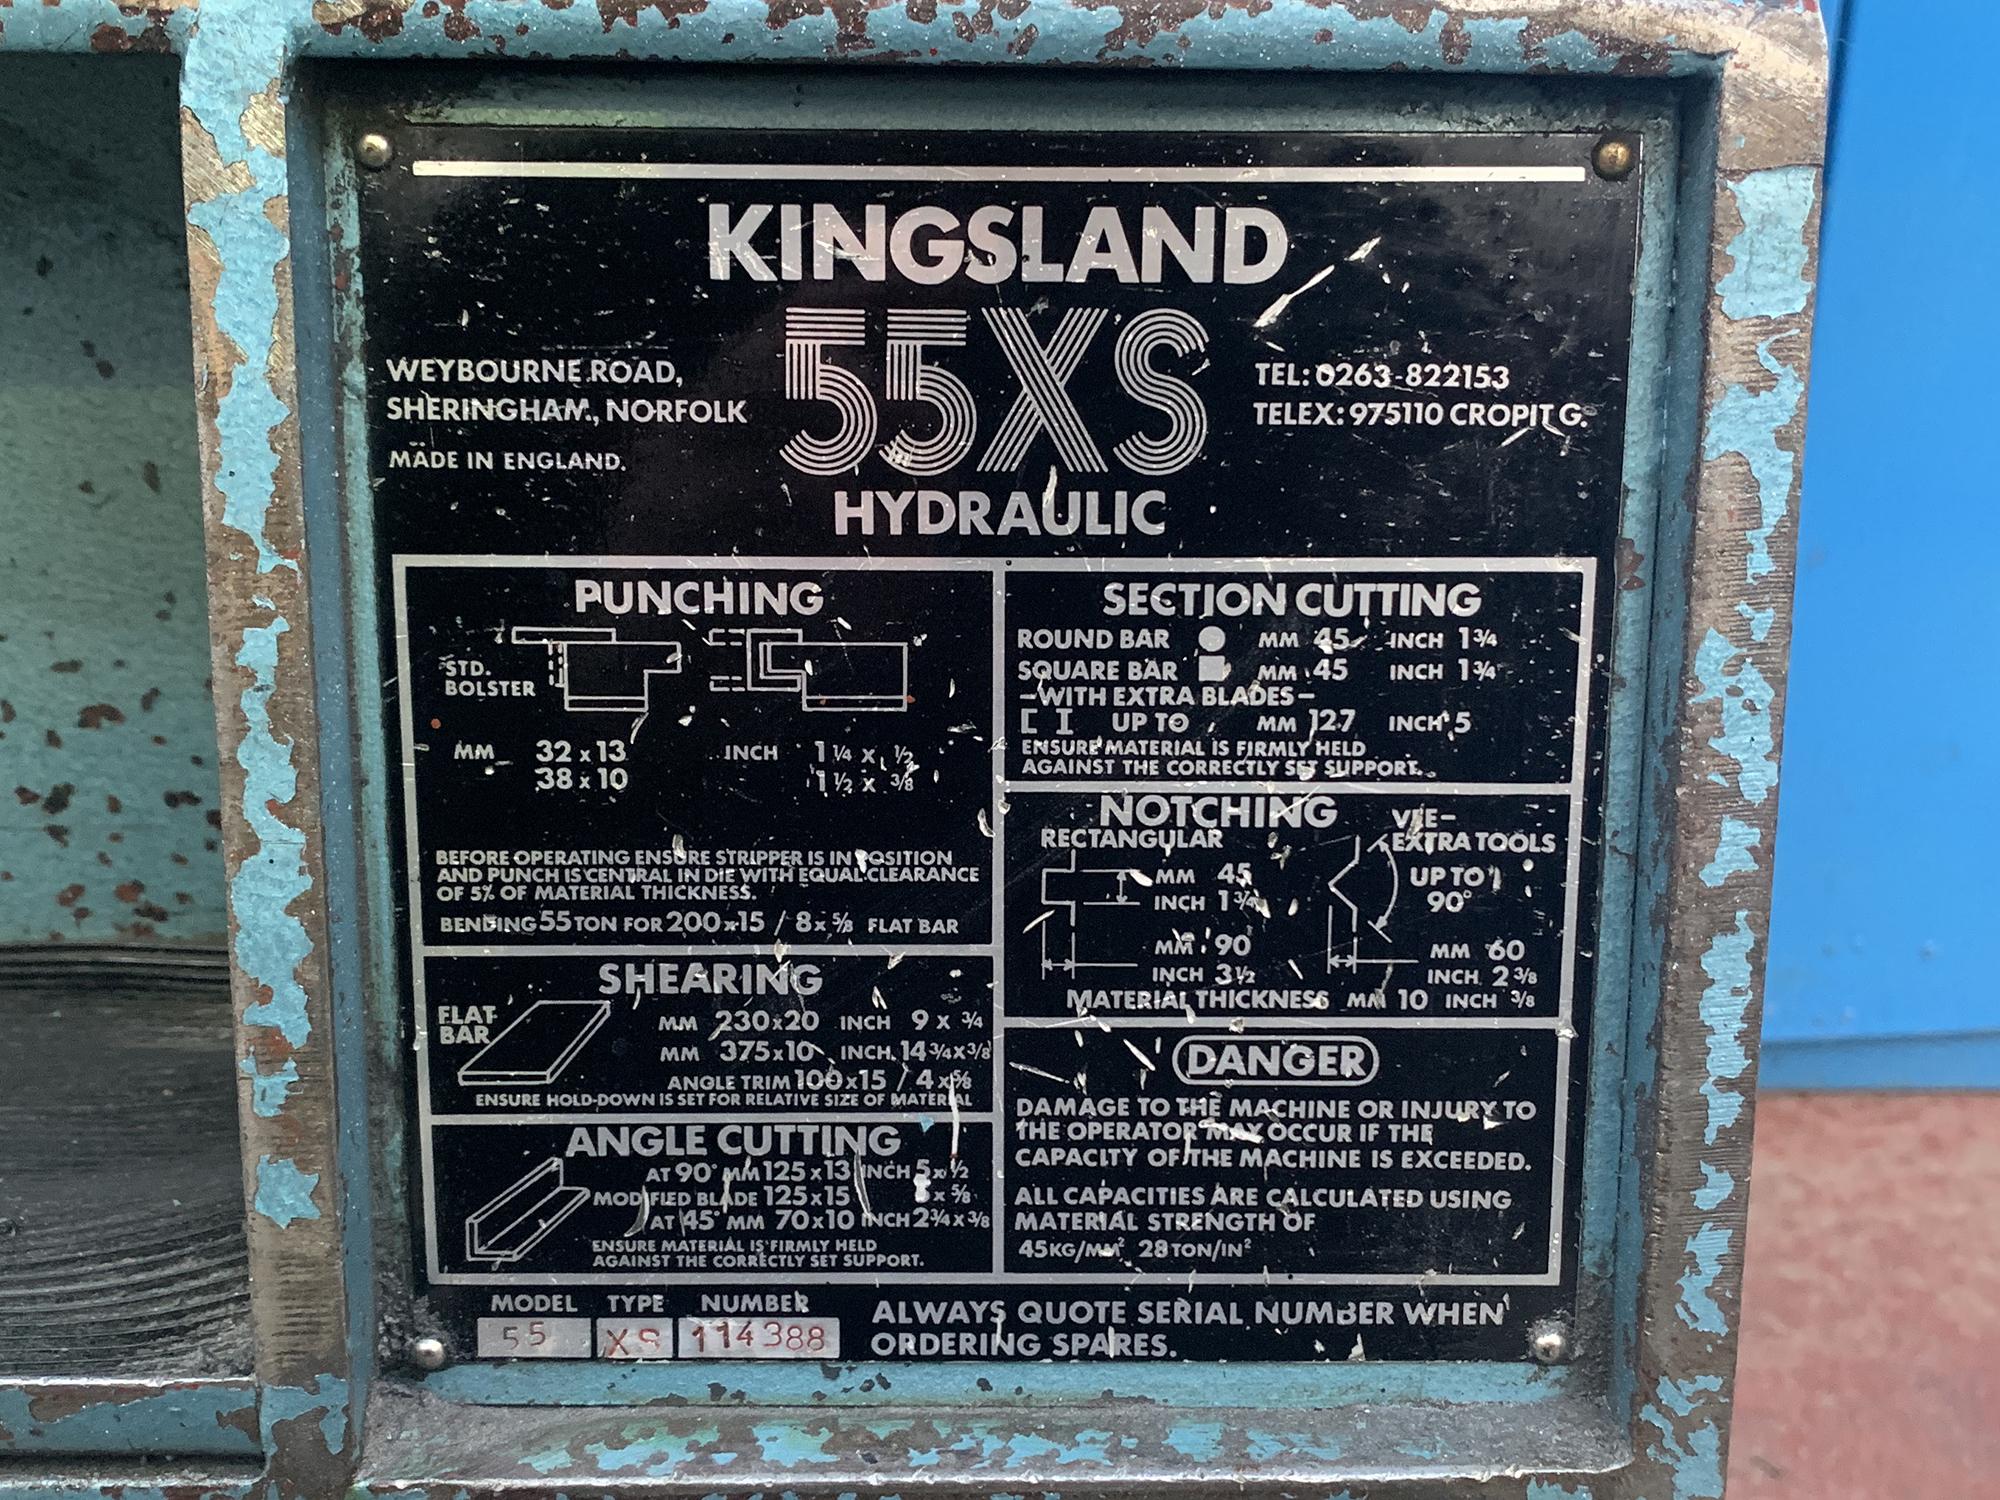 Kingsland 55XS Iron Worker. 55 Ton Capacity. - Image 8 of 8